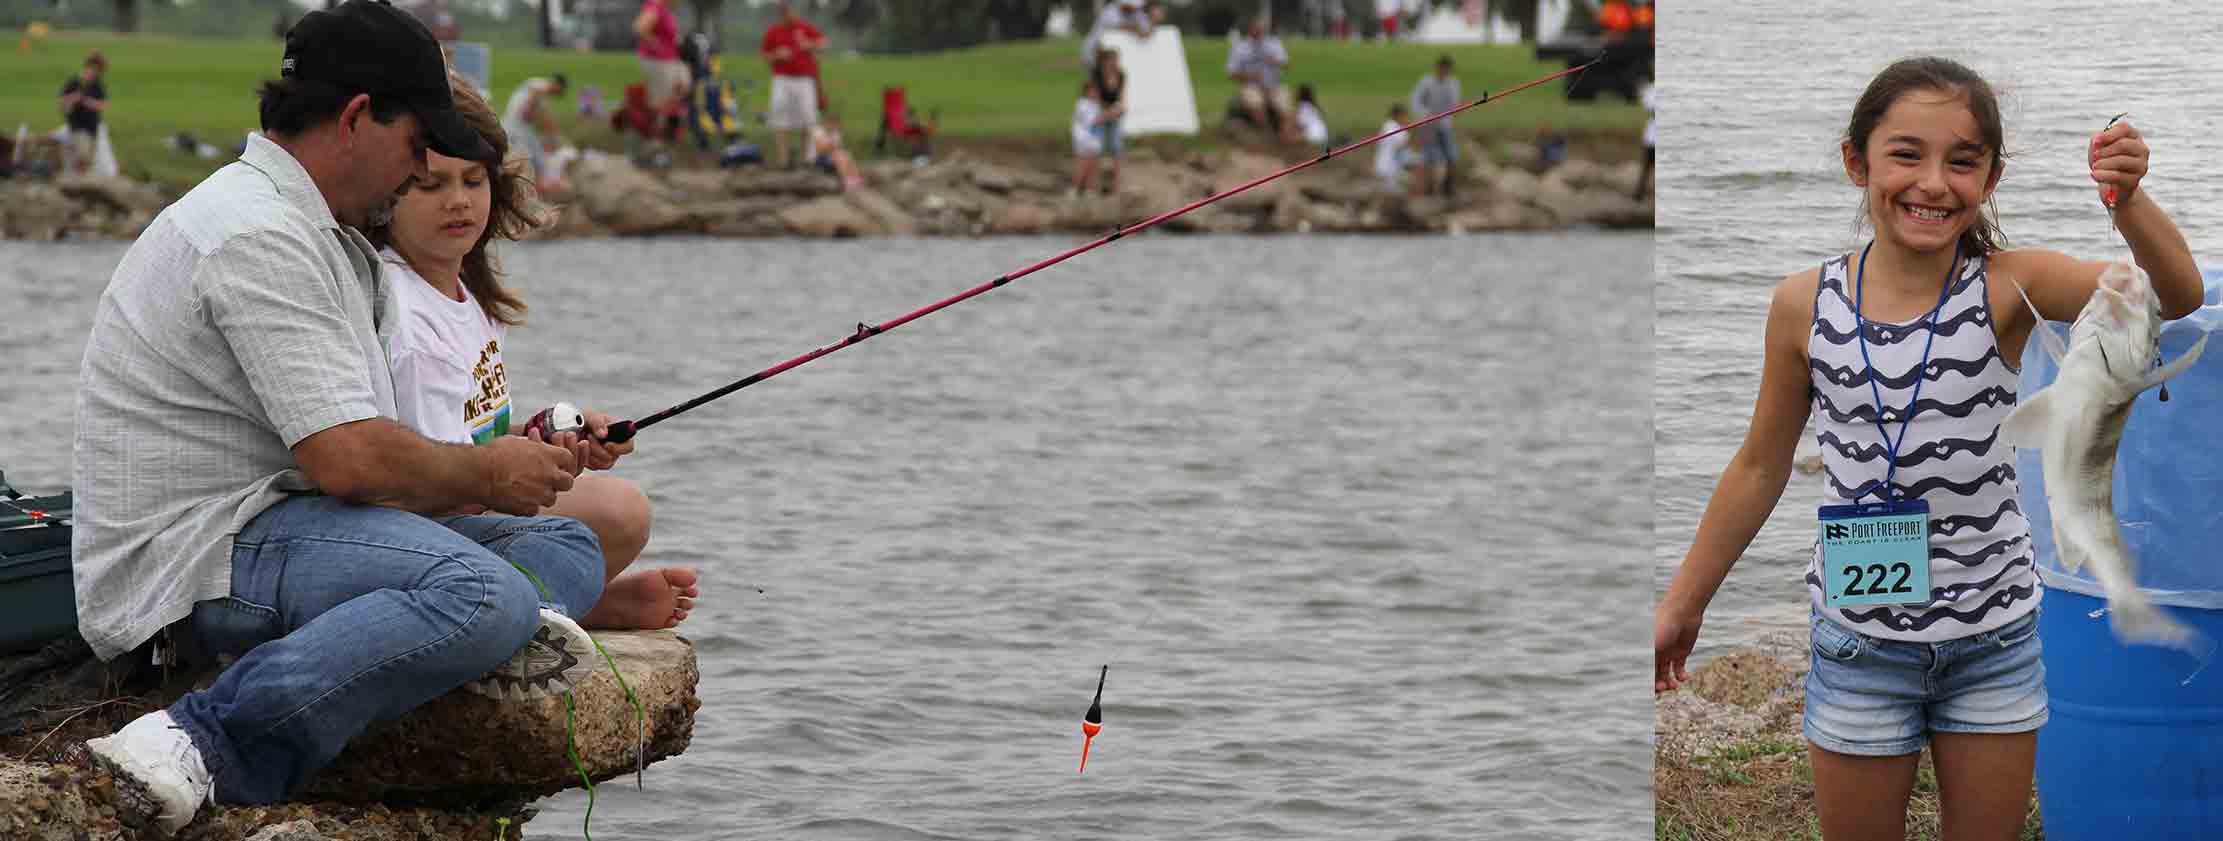 port freeport fishing tournament